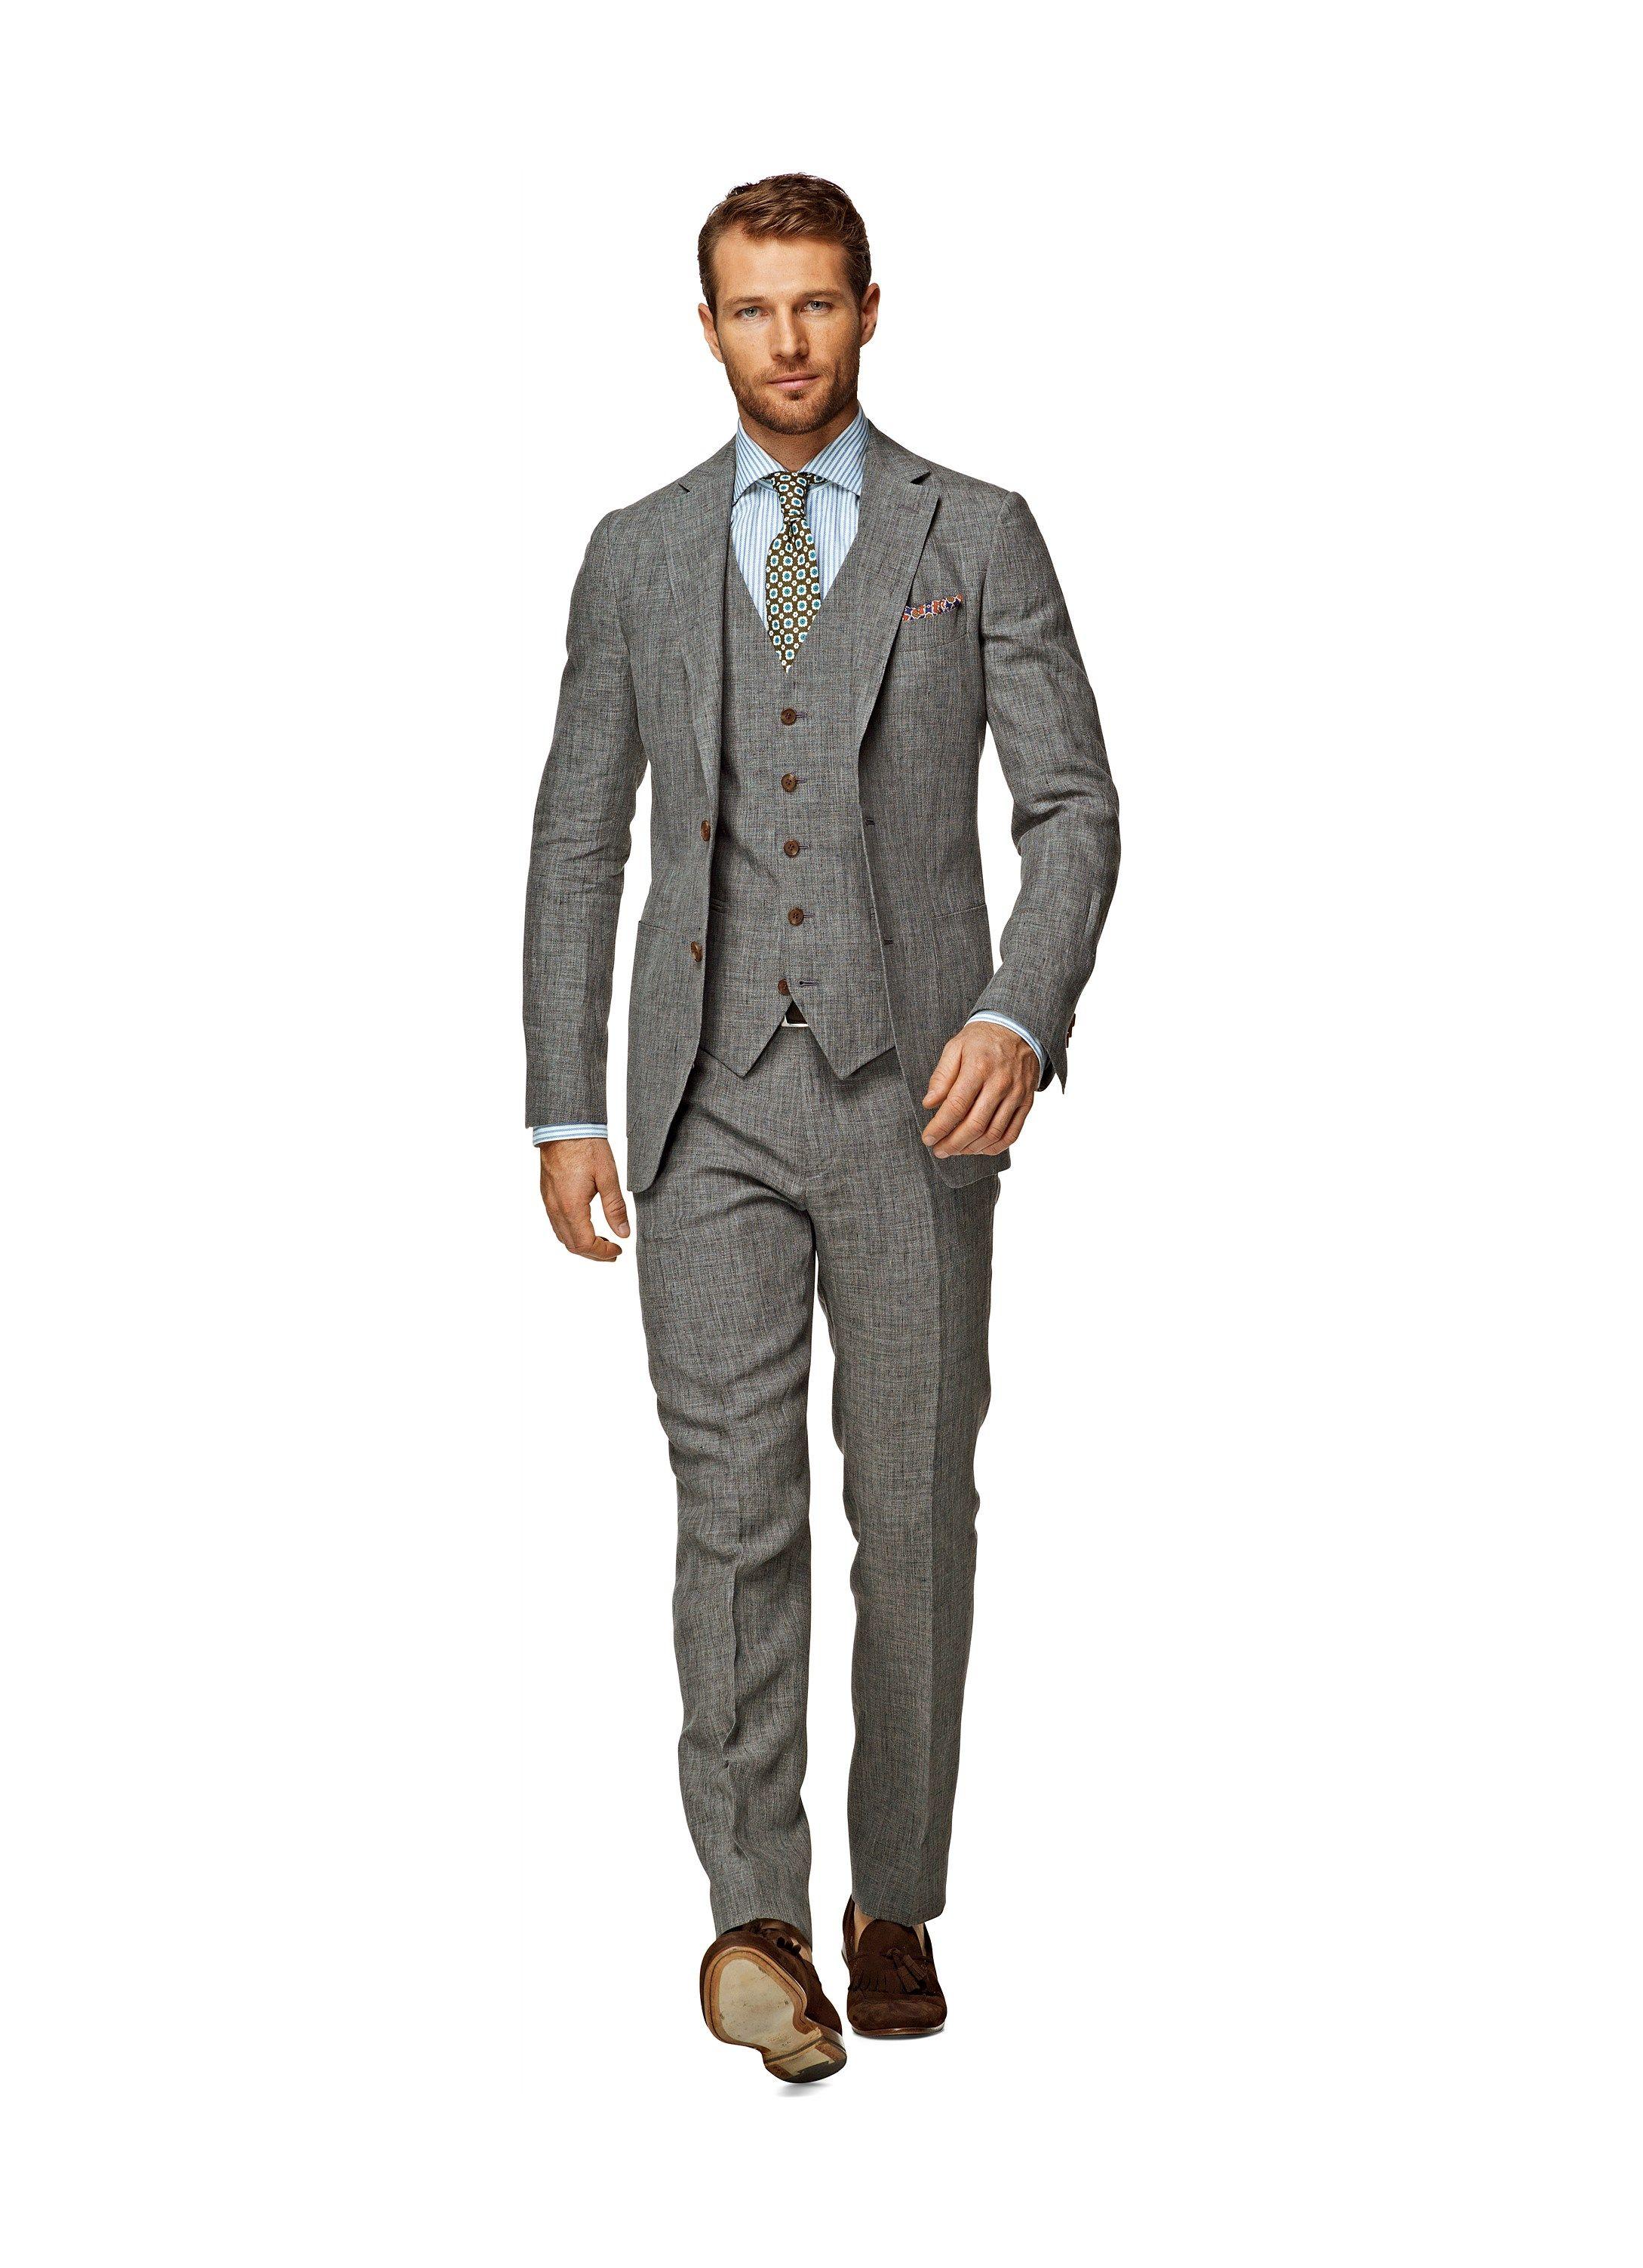 Vince dickson handsome clean shaven non black men in suits